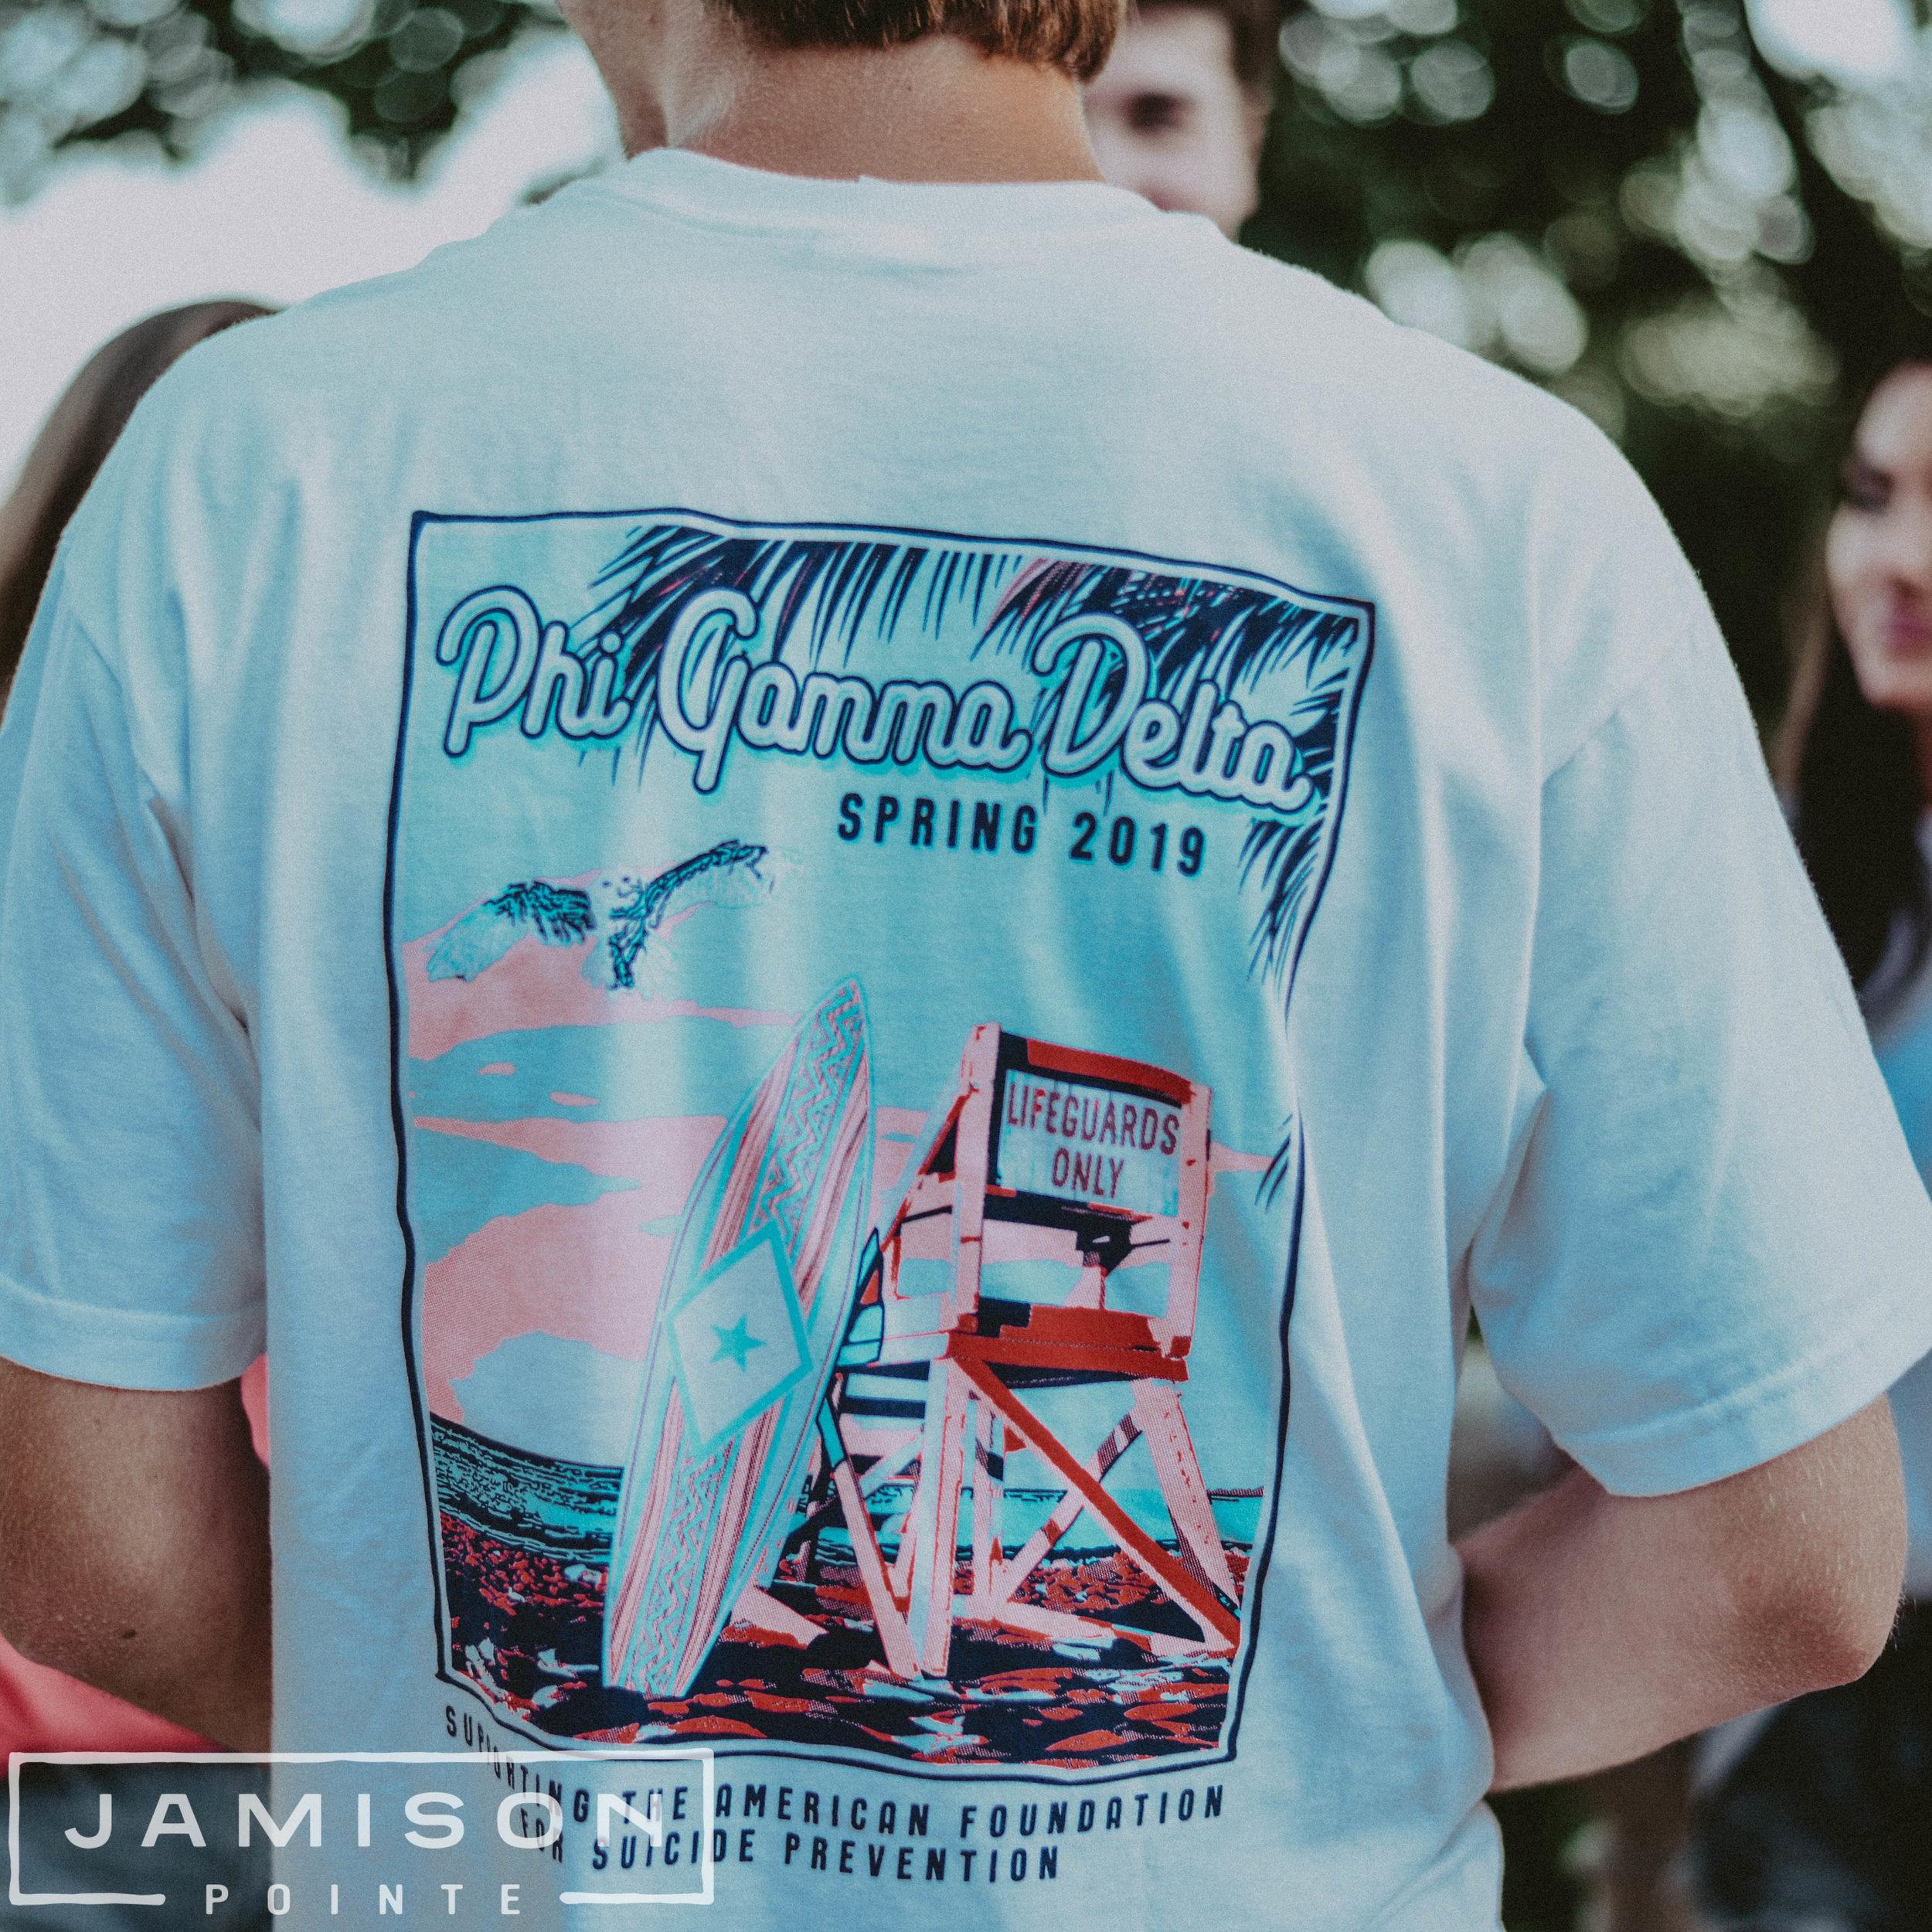 Phi Gamma Delta Spring Philanthropy Tee